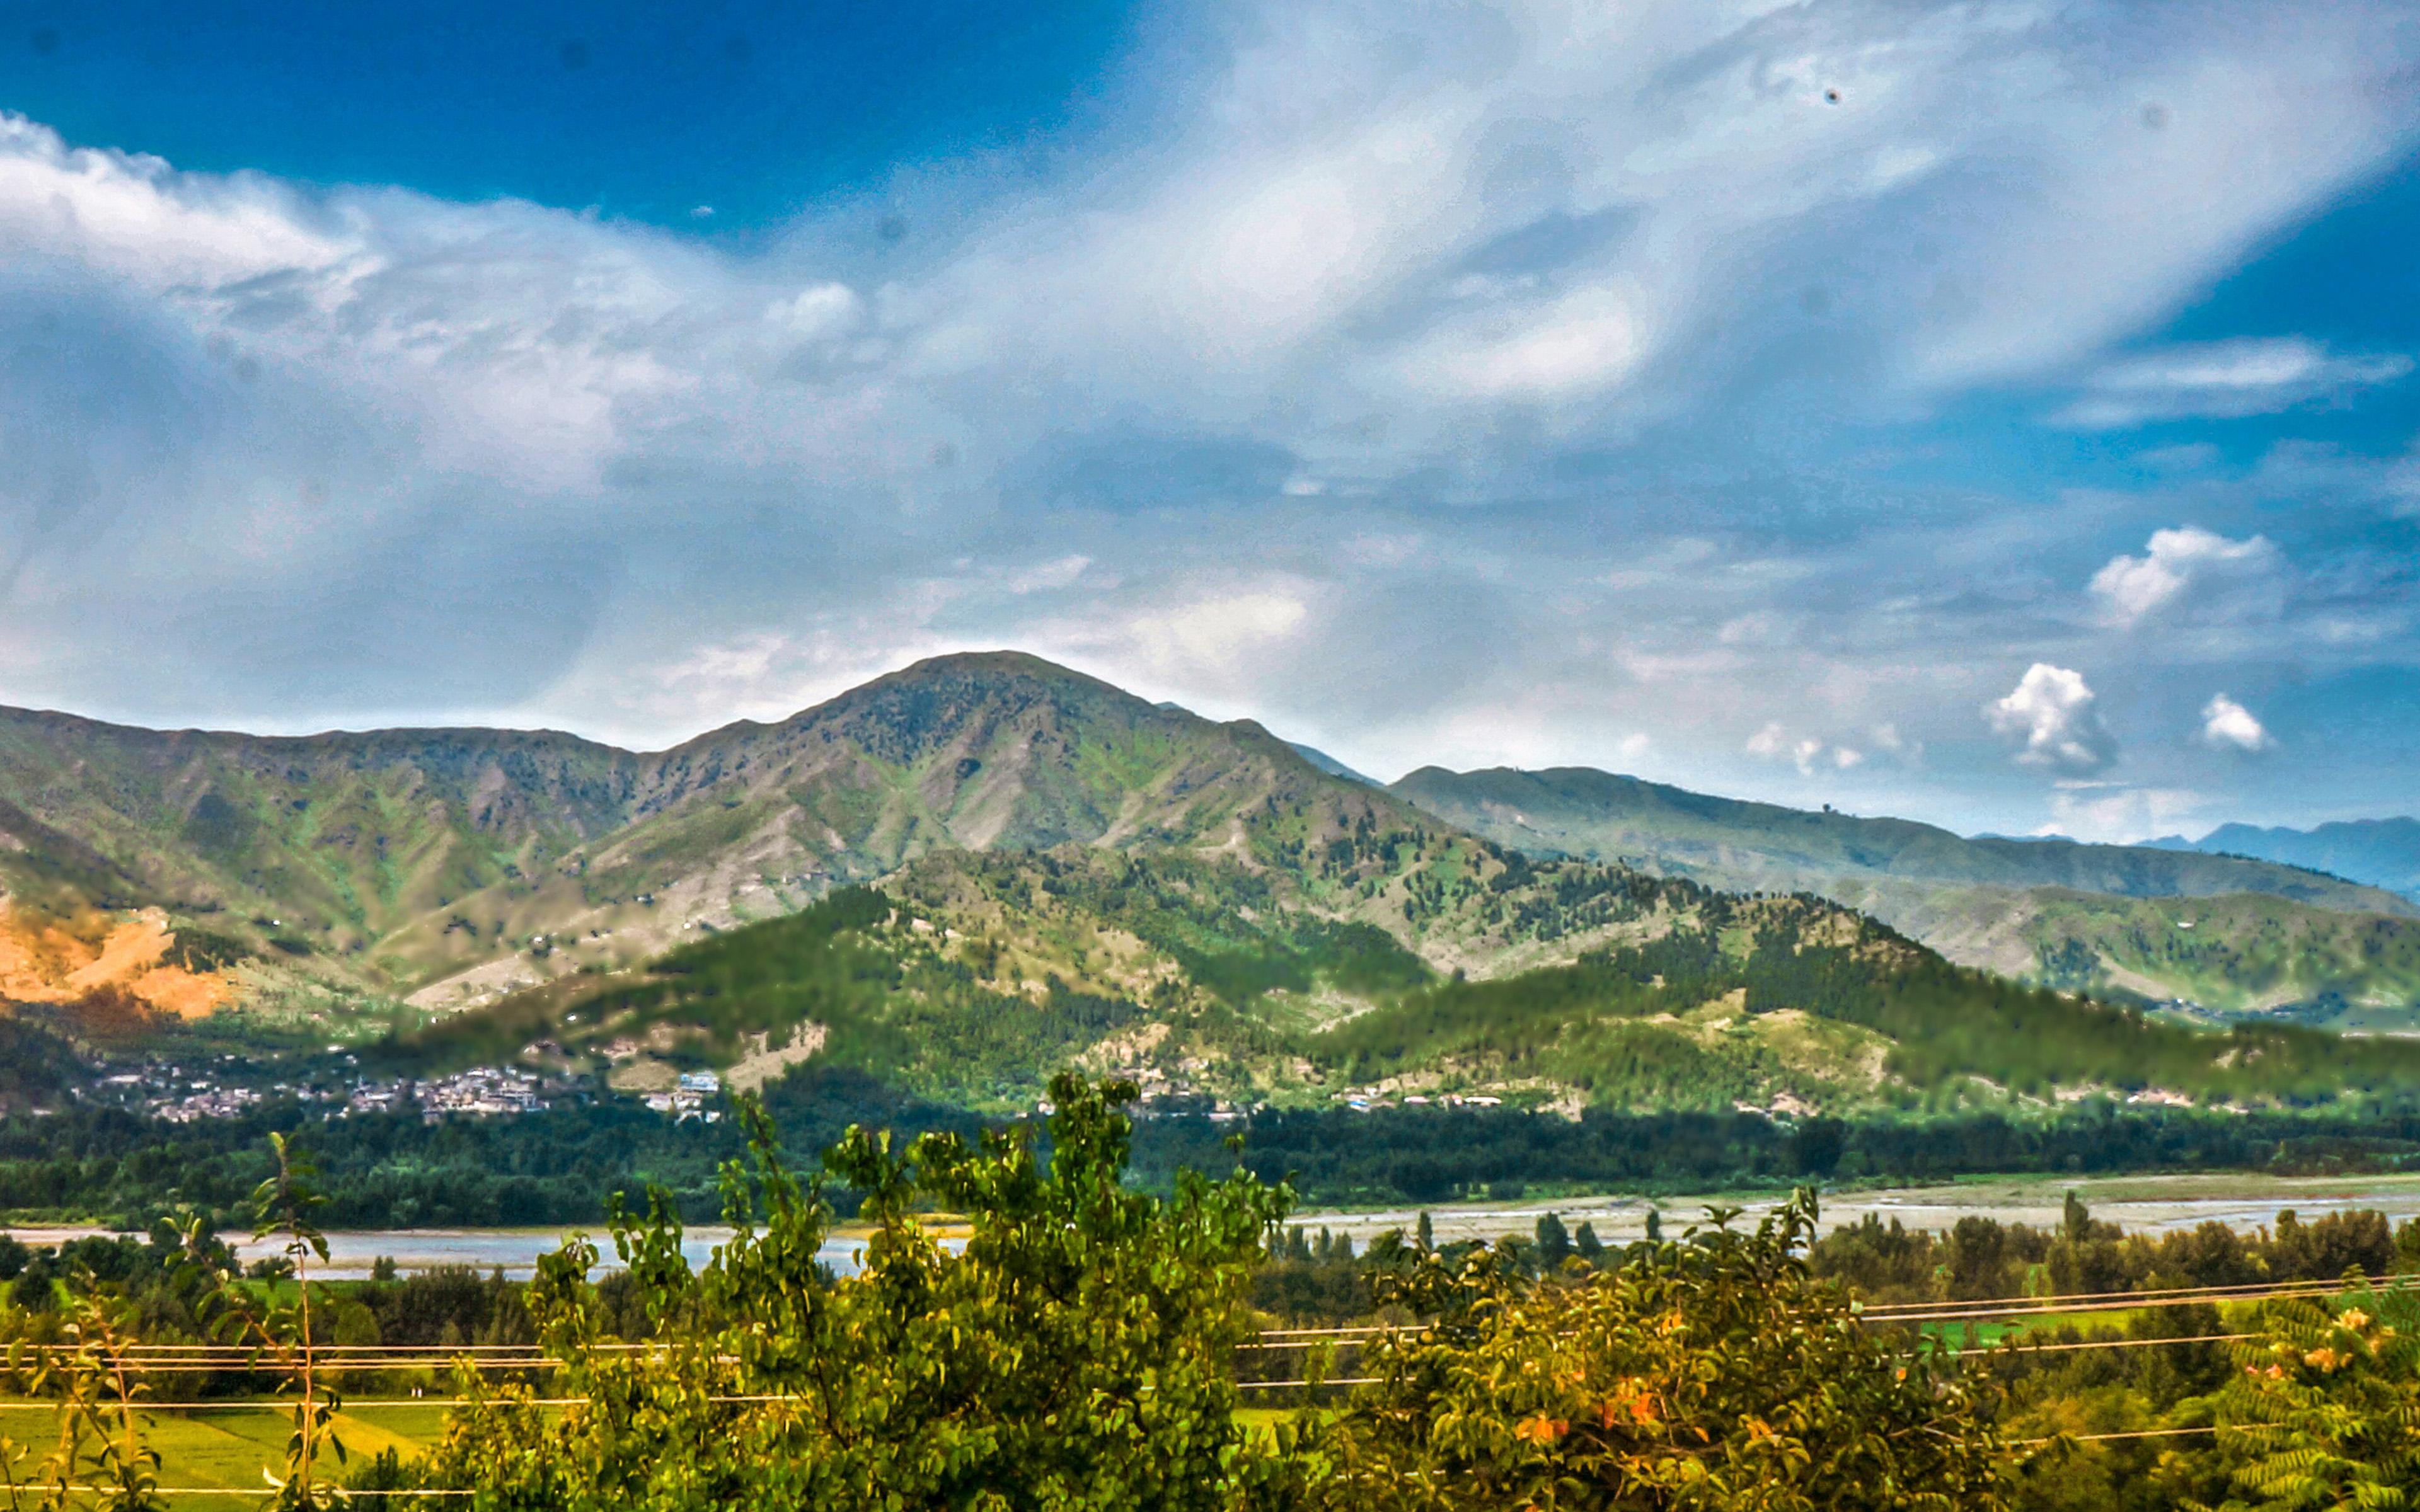 nw23-summer-sky-cloud-mountain-nature-wallpaper